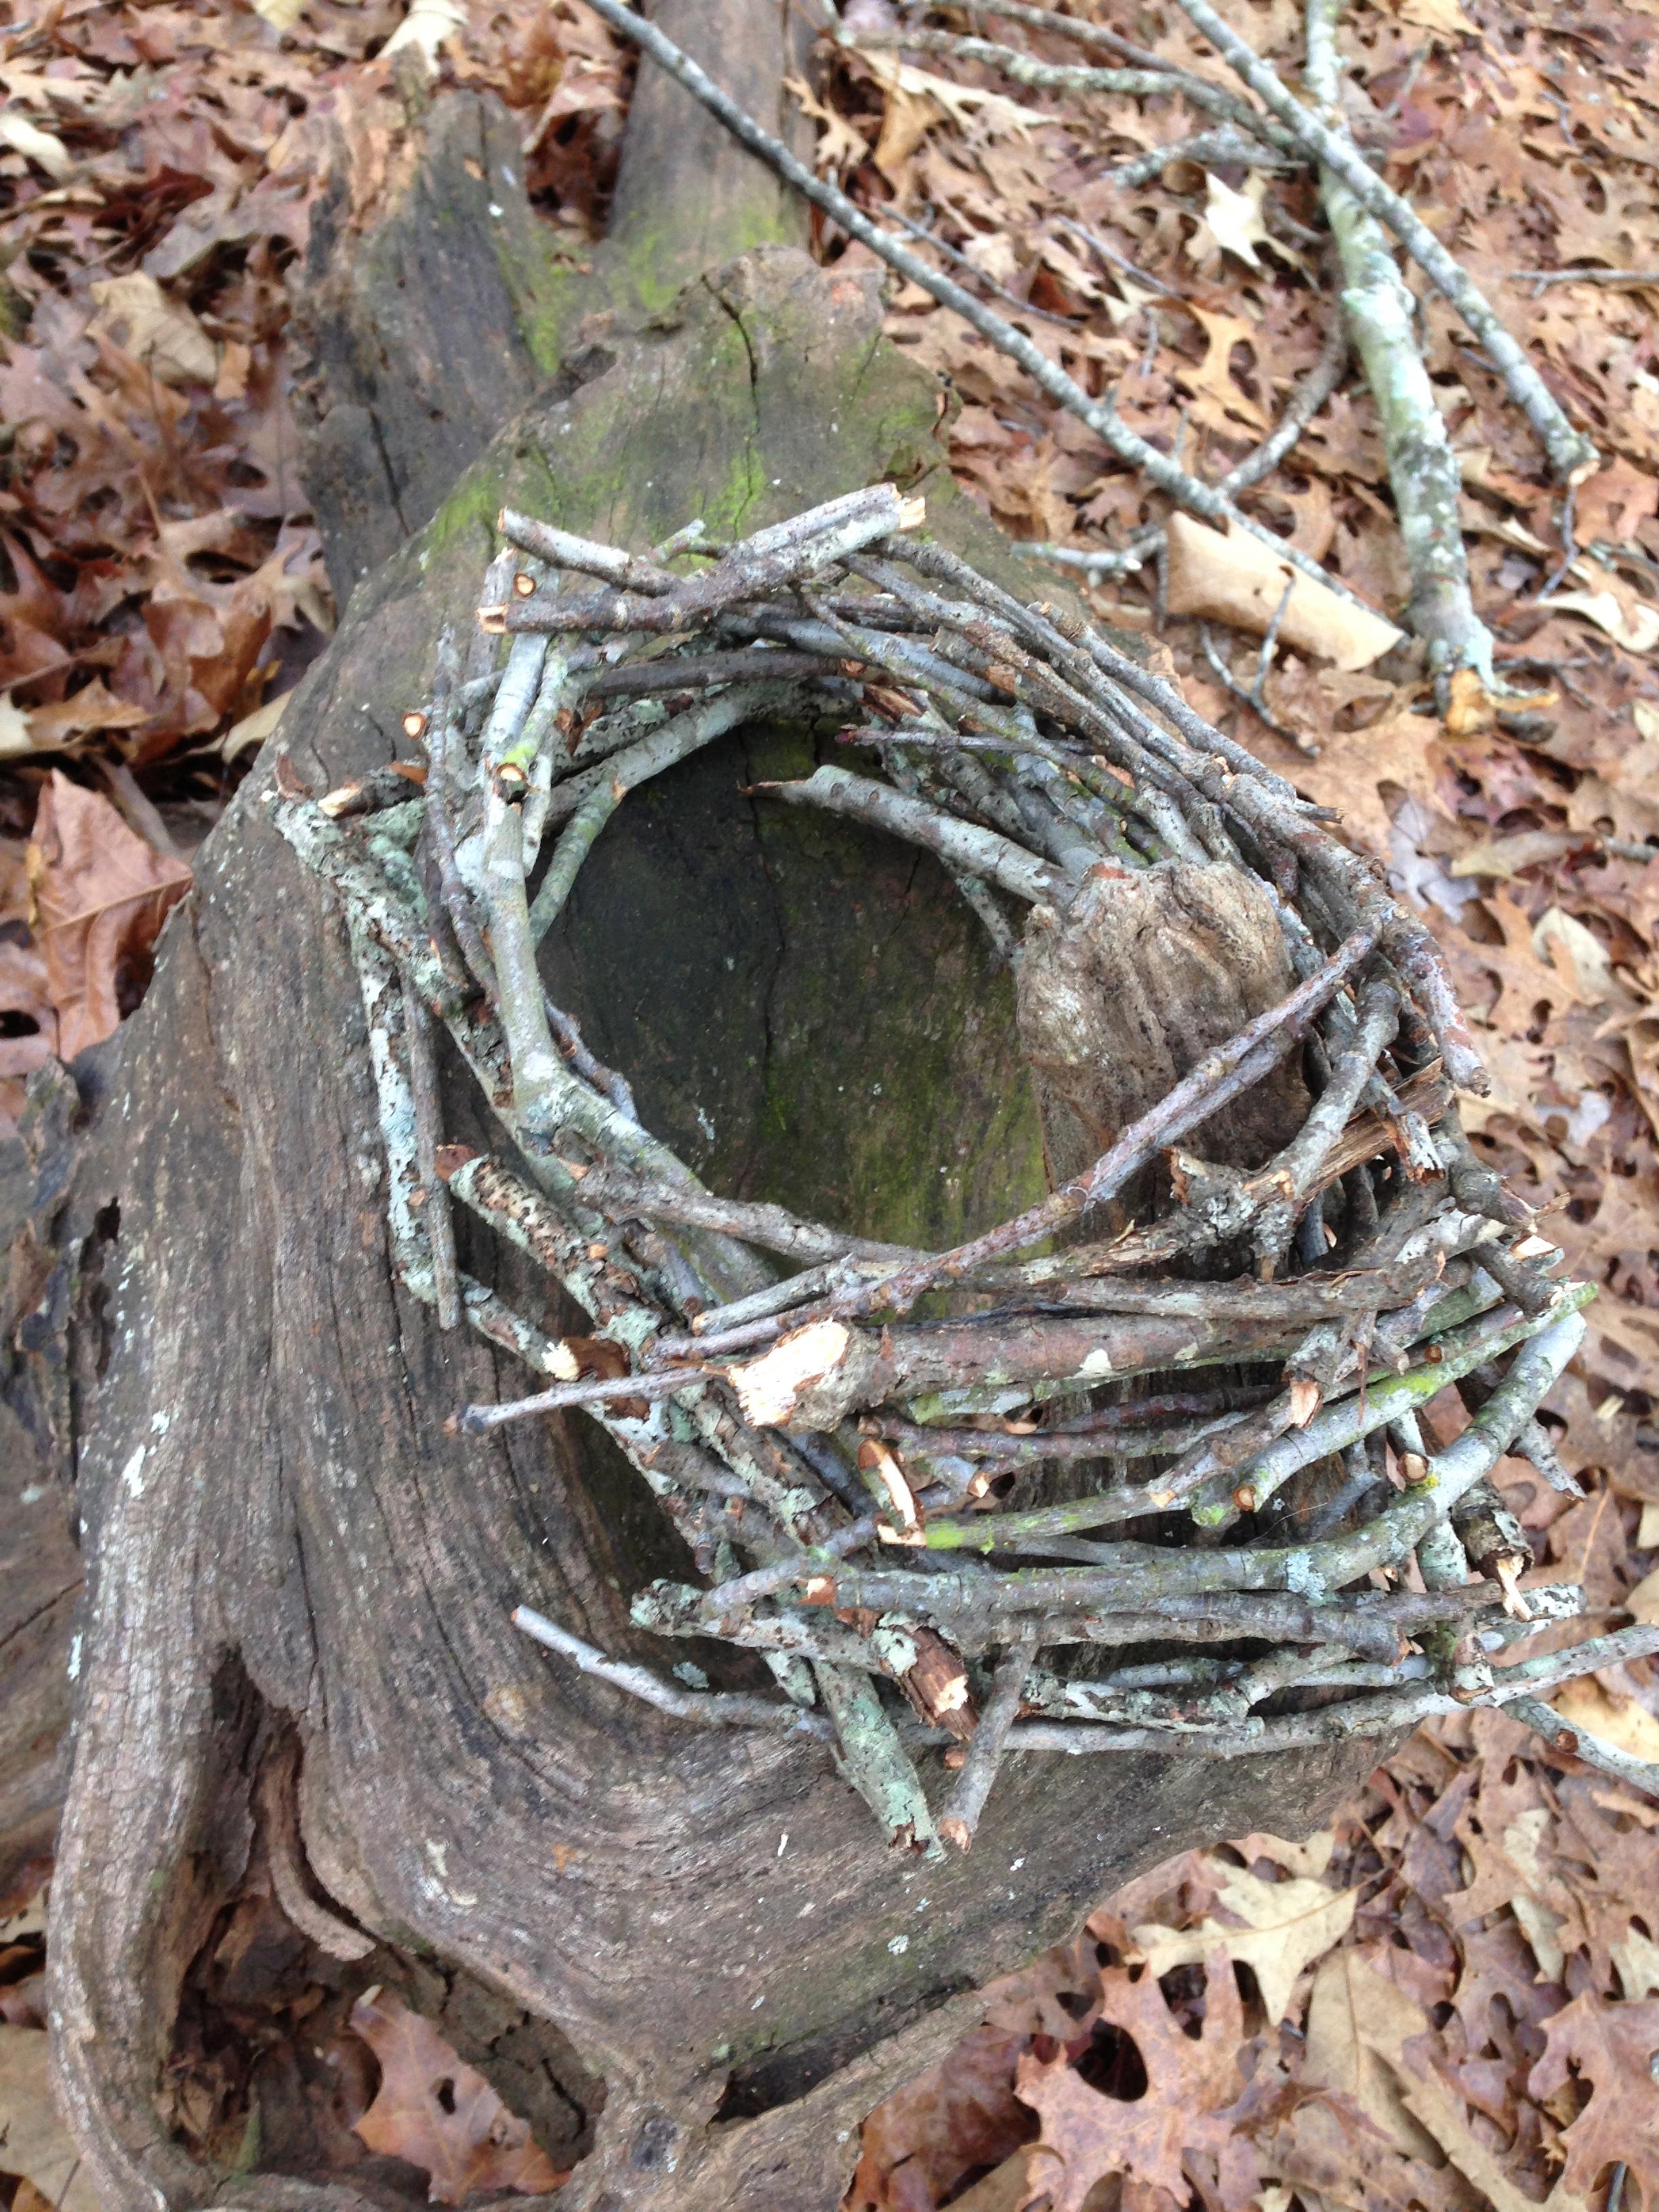 Nest on stump. Lake Herrick Trails. The University of Georgia. Athens, GA. Winter 2013